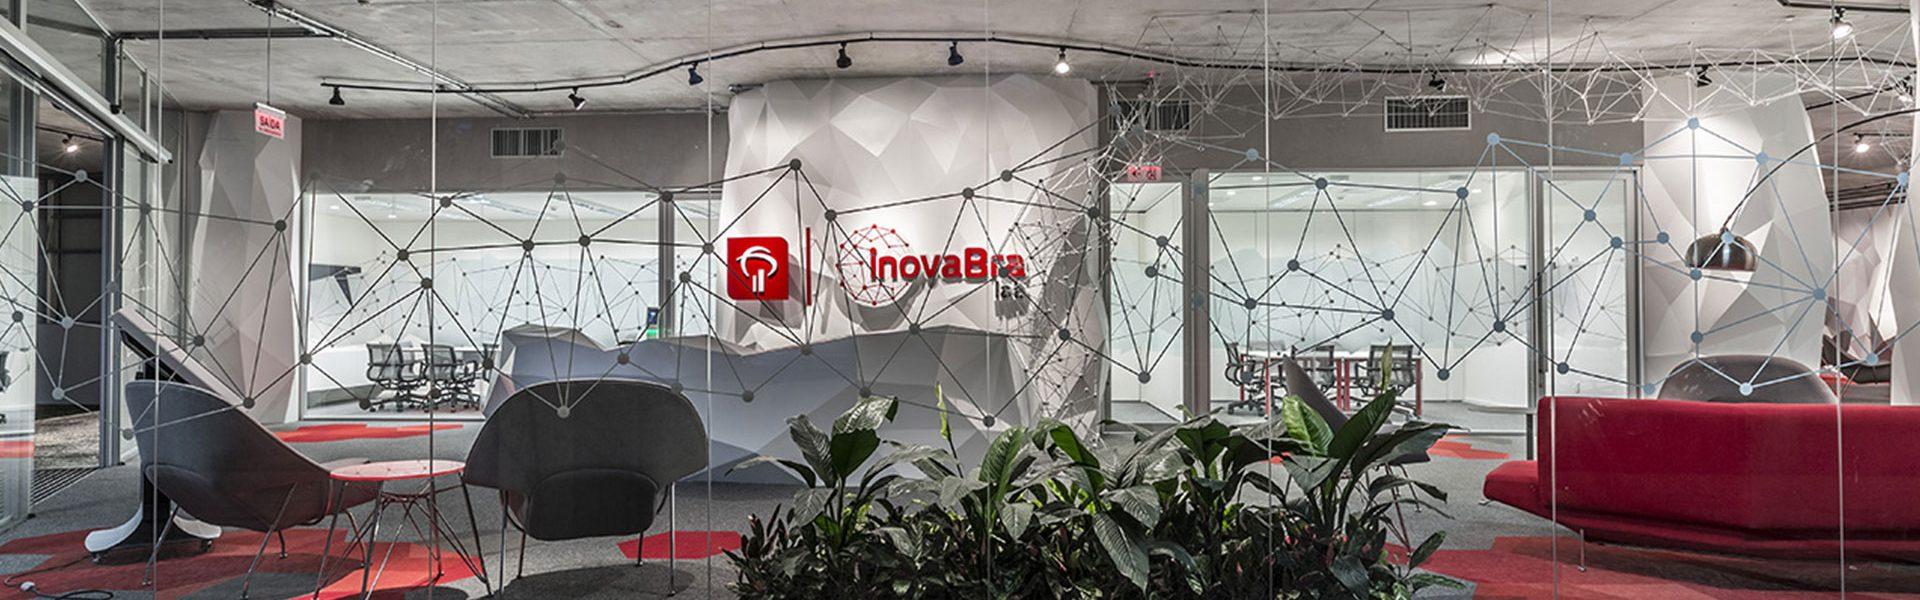 Inovabra1